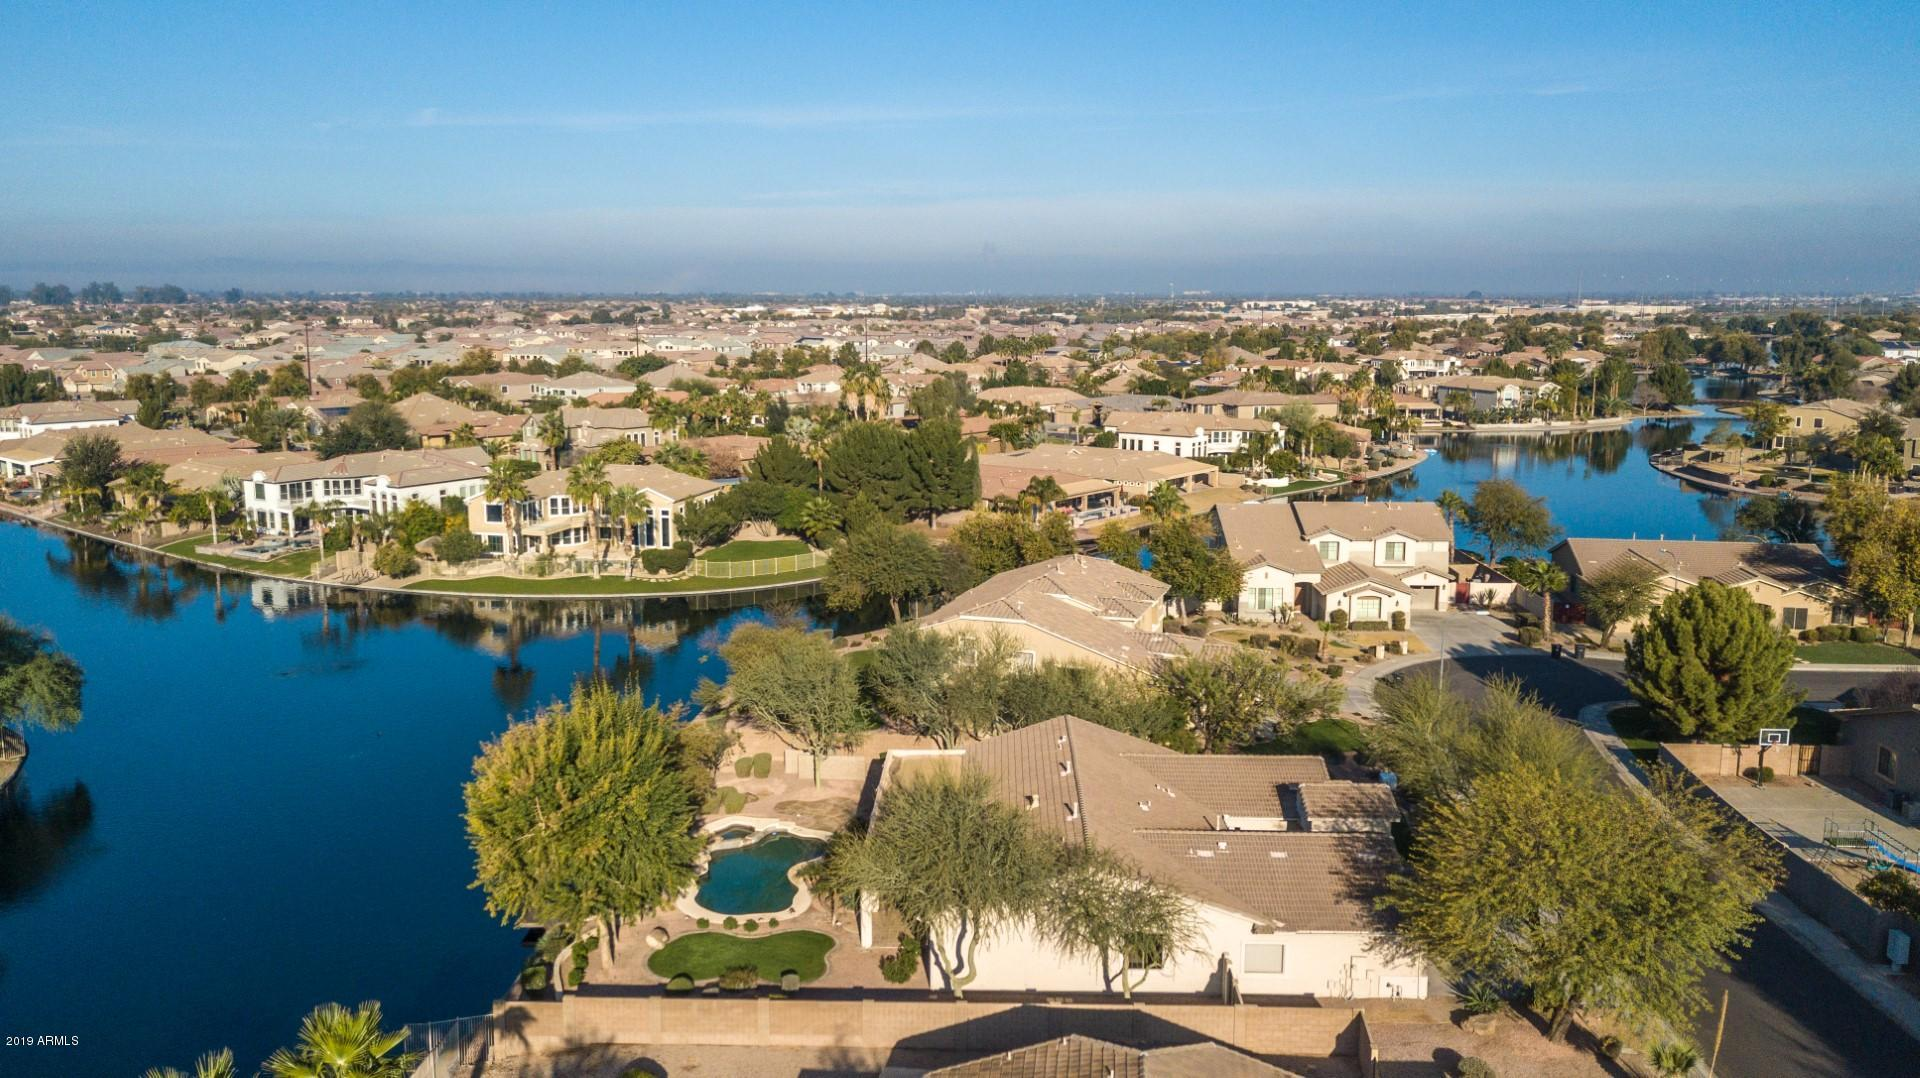 MLS 5869432 4888 S FRESNO Street, Chandler, AZ 85249 Chandler AZ Pinelake Estates